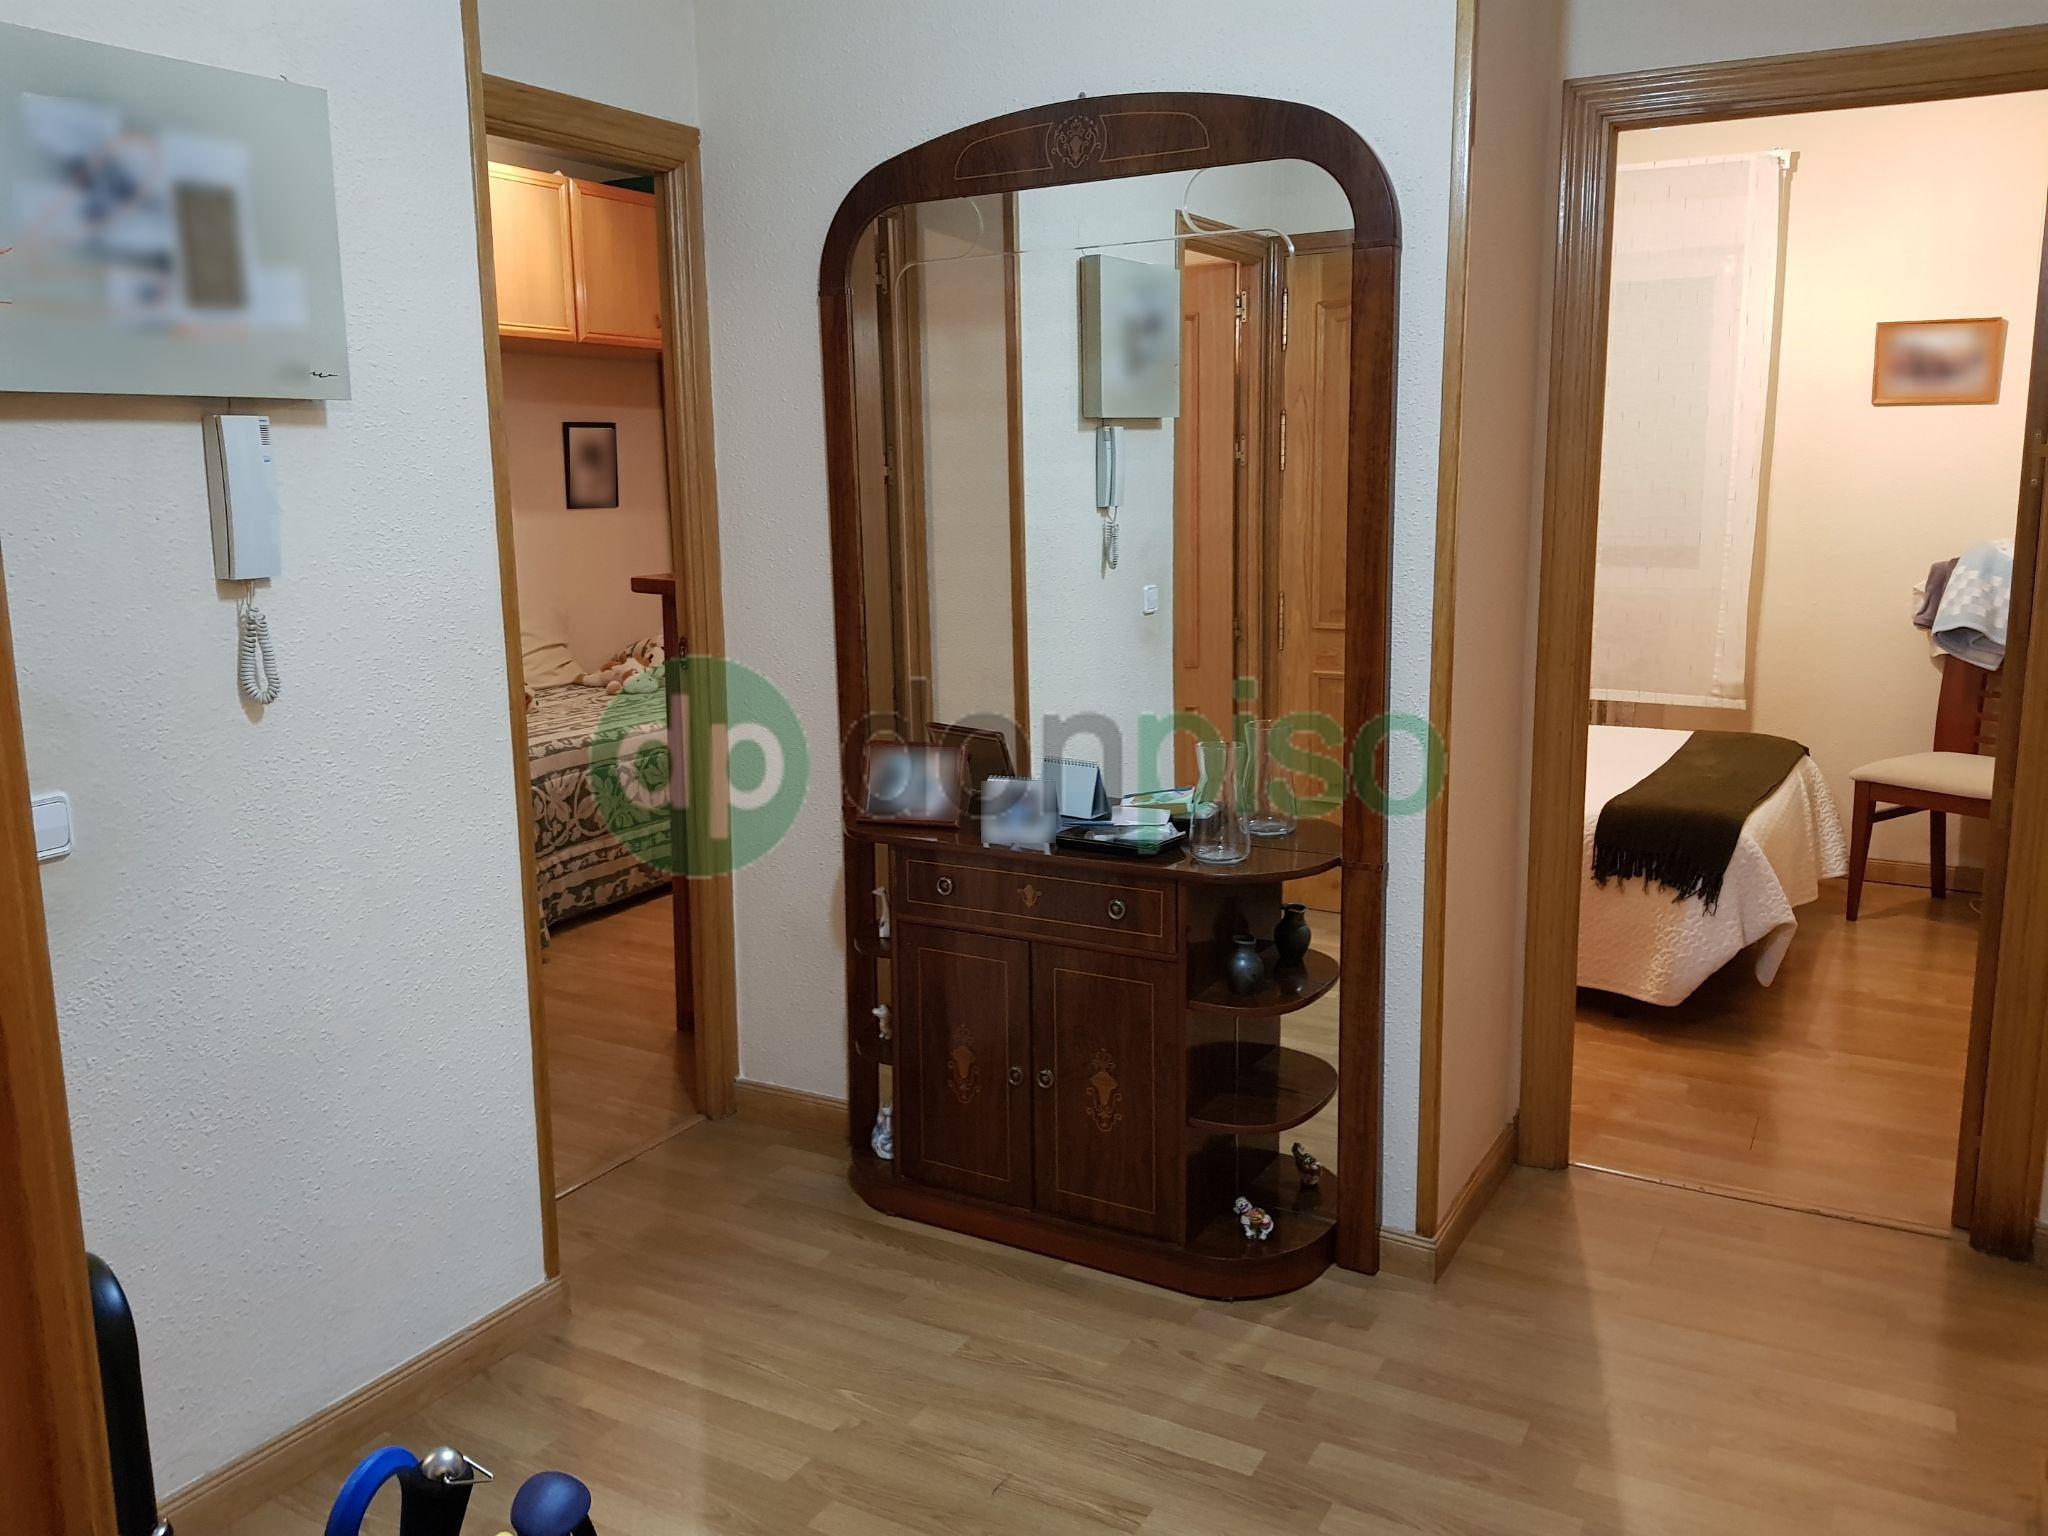 Imagen 4 Piso en venta en Mondéjar / Junto Carretera